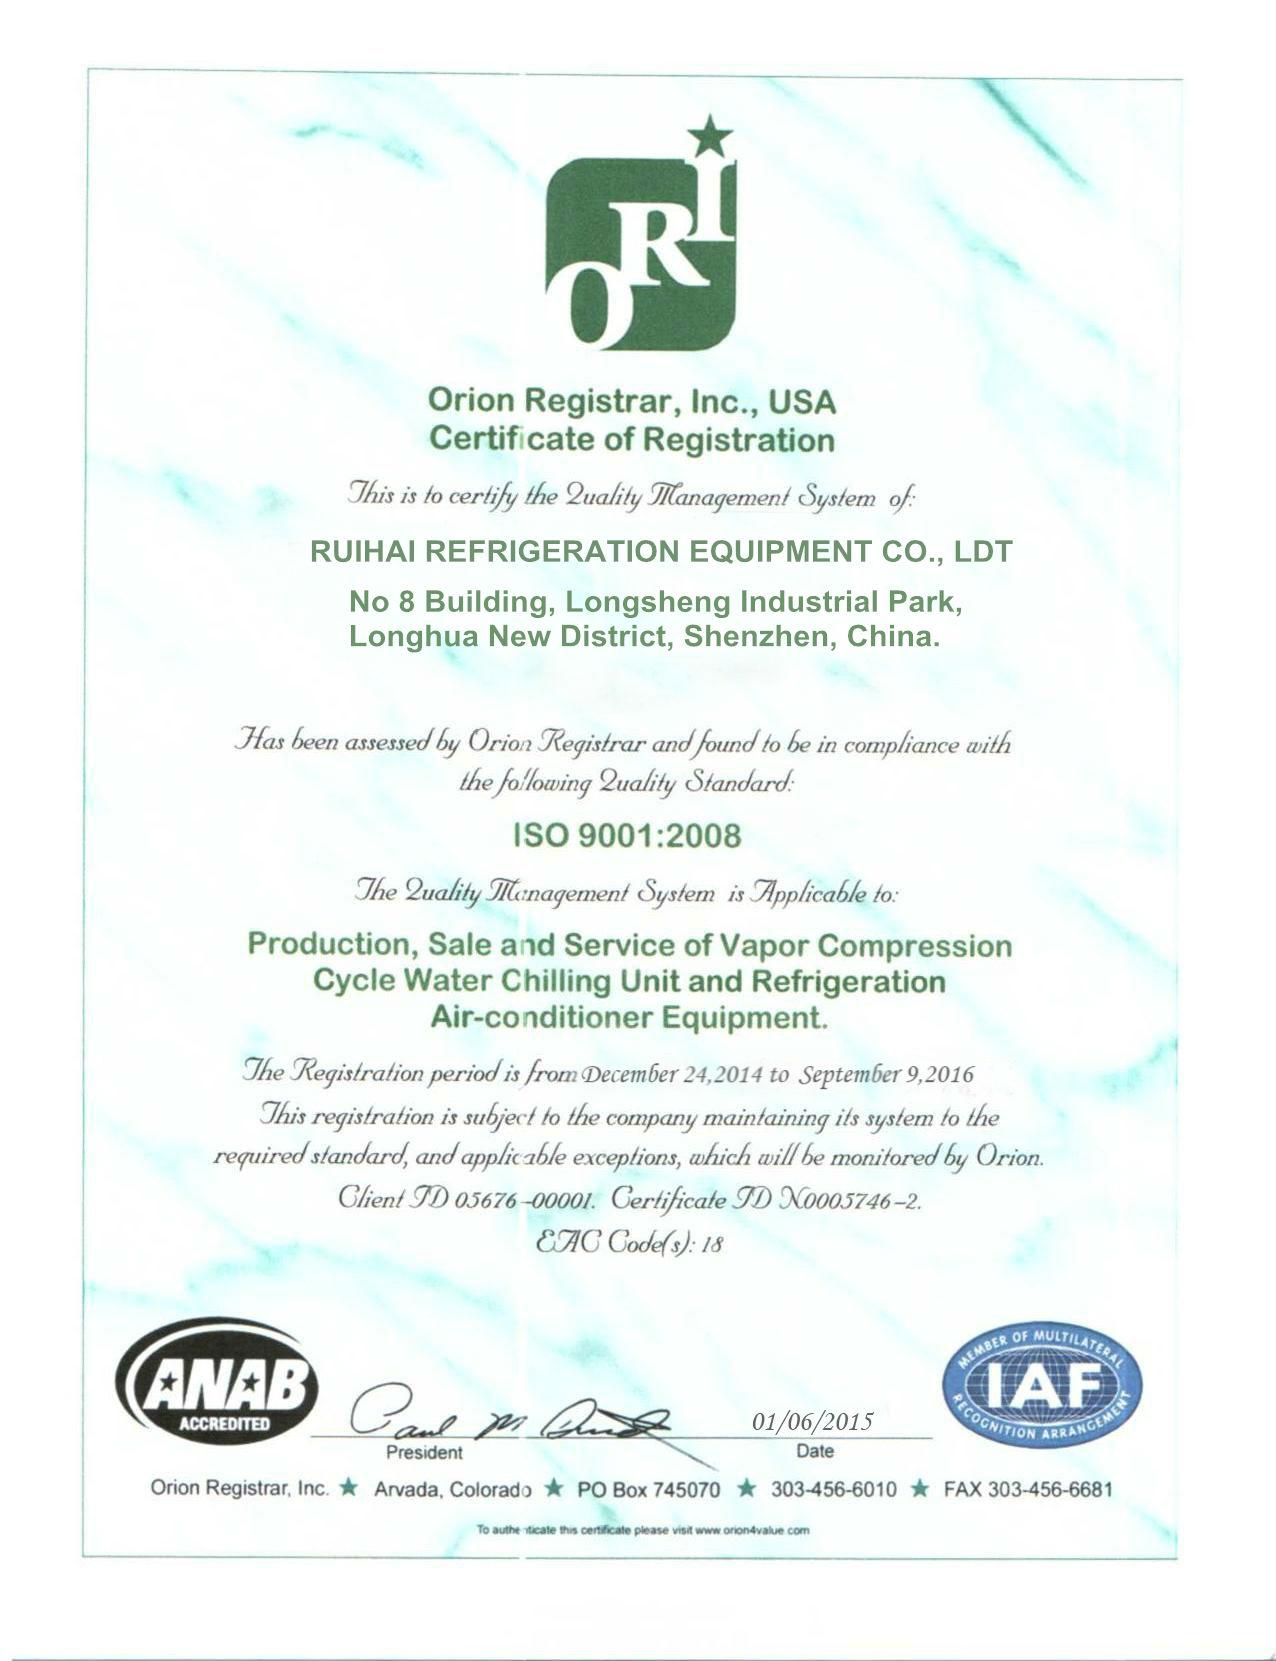 ISO9001 Cetification for Ruihai Refrigeration Equipment Co.,Ltd